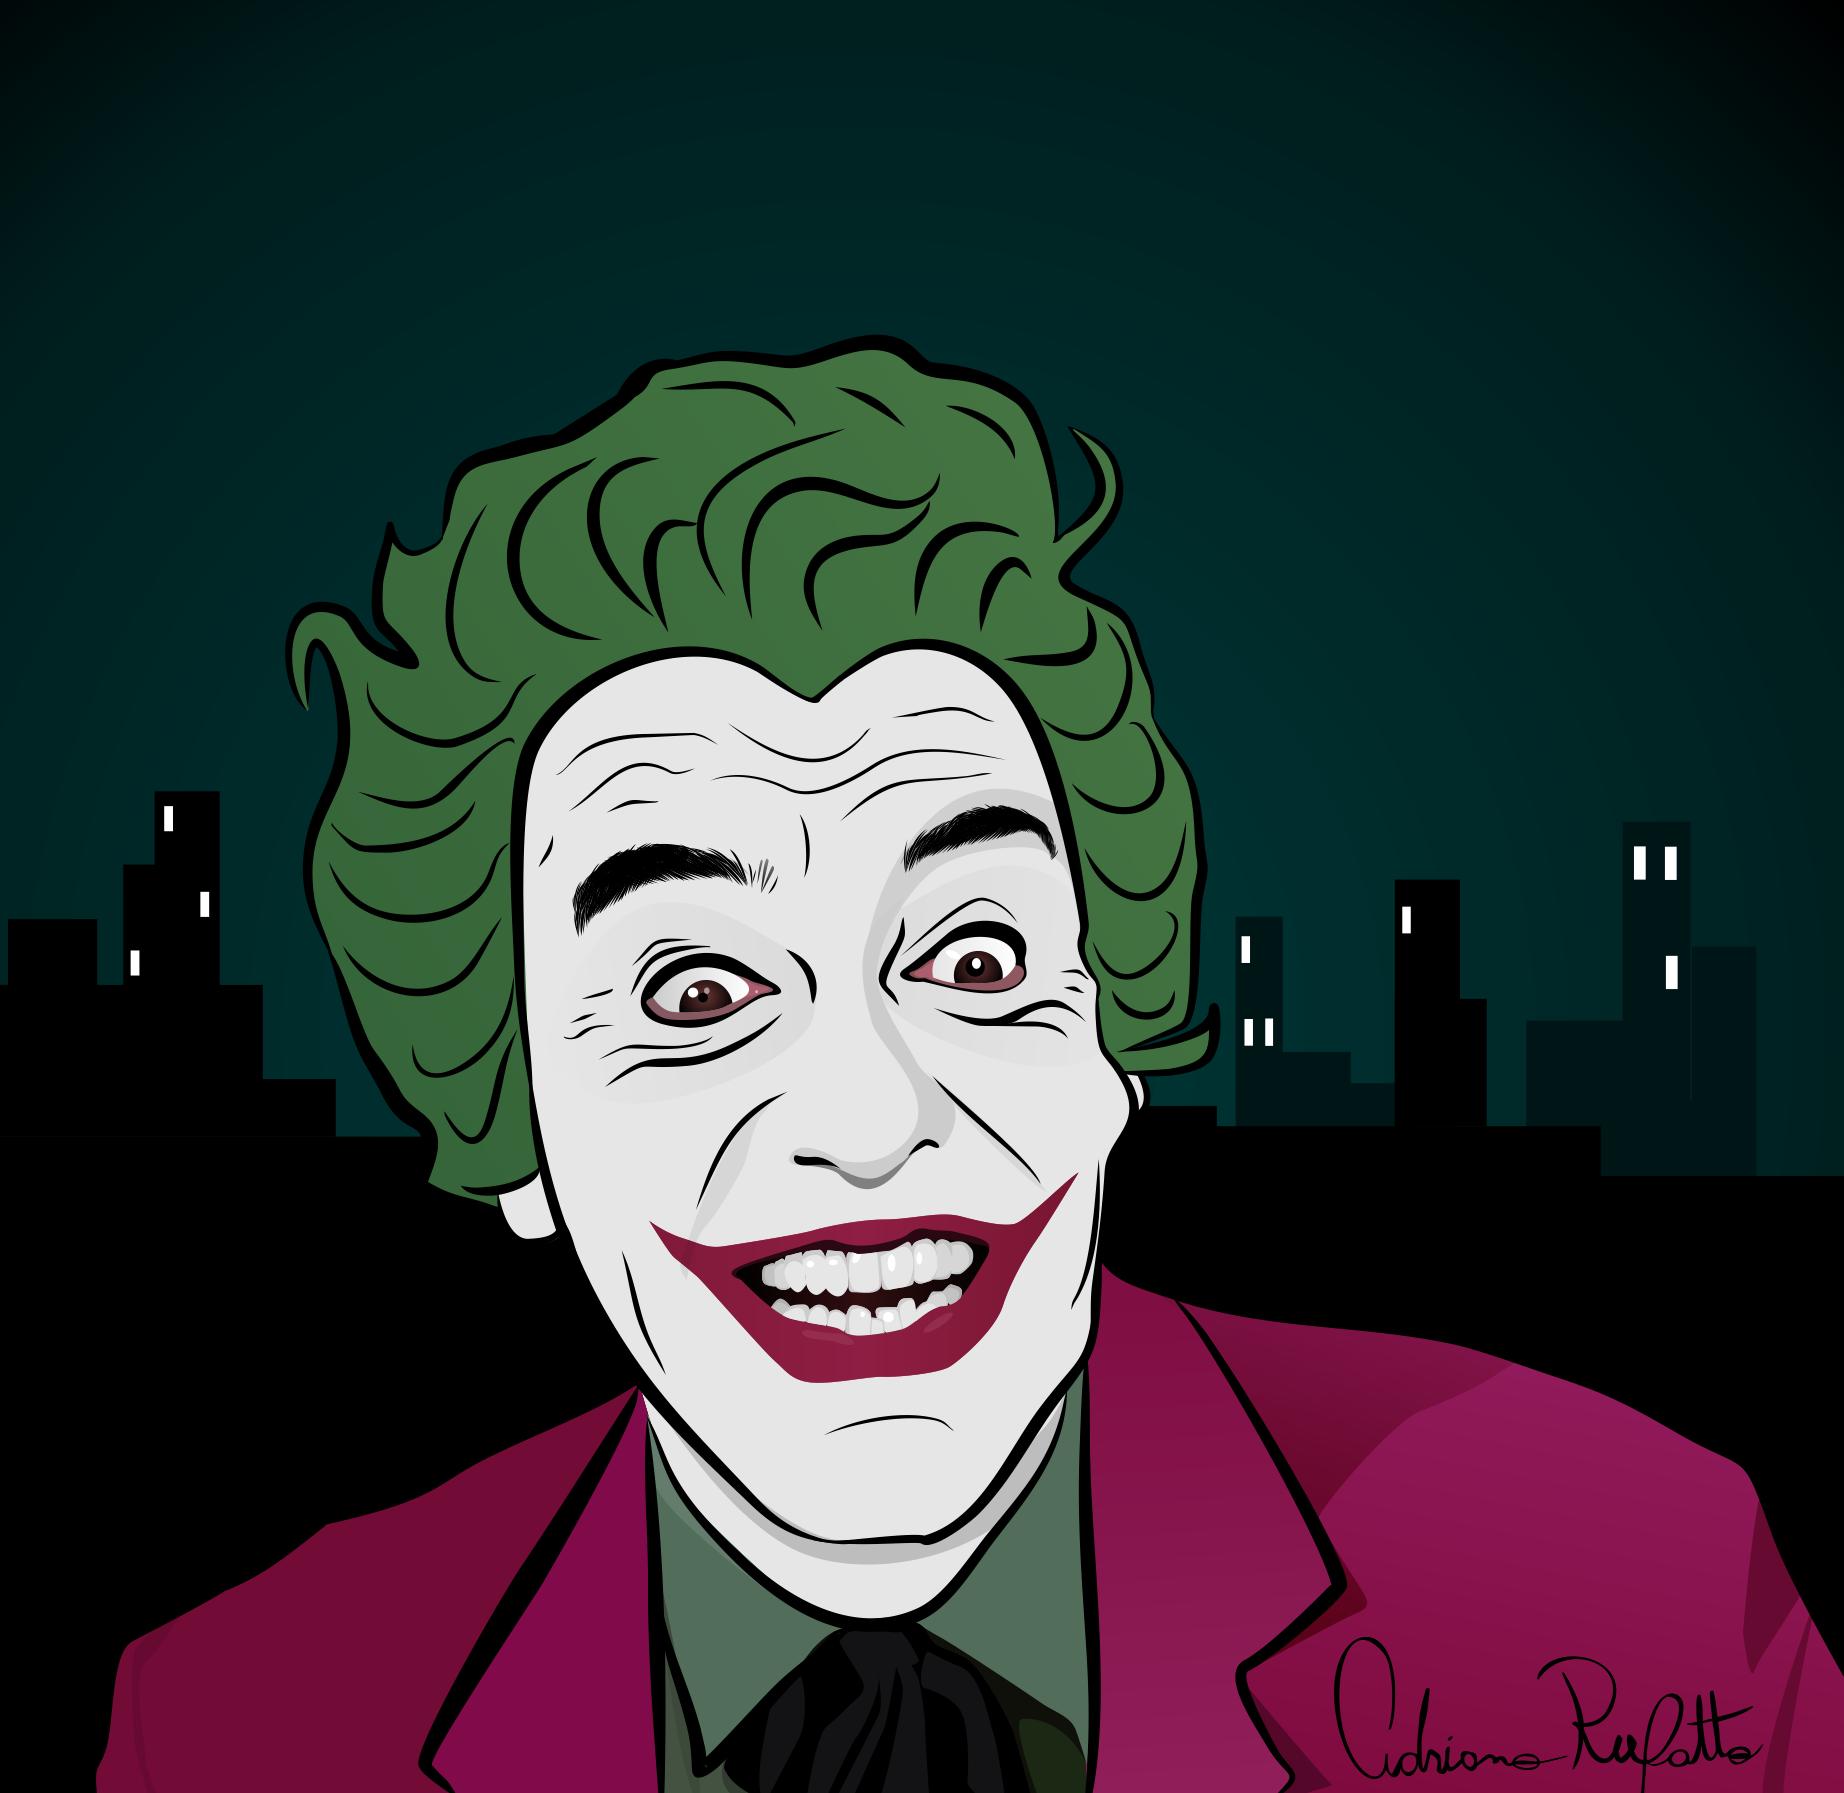 classic joker images - photo #6